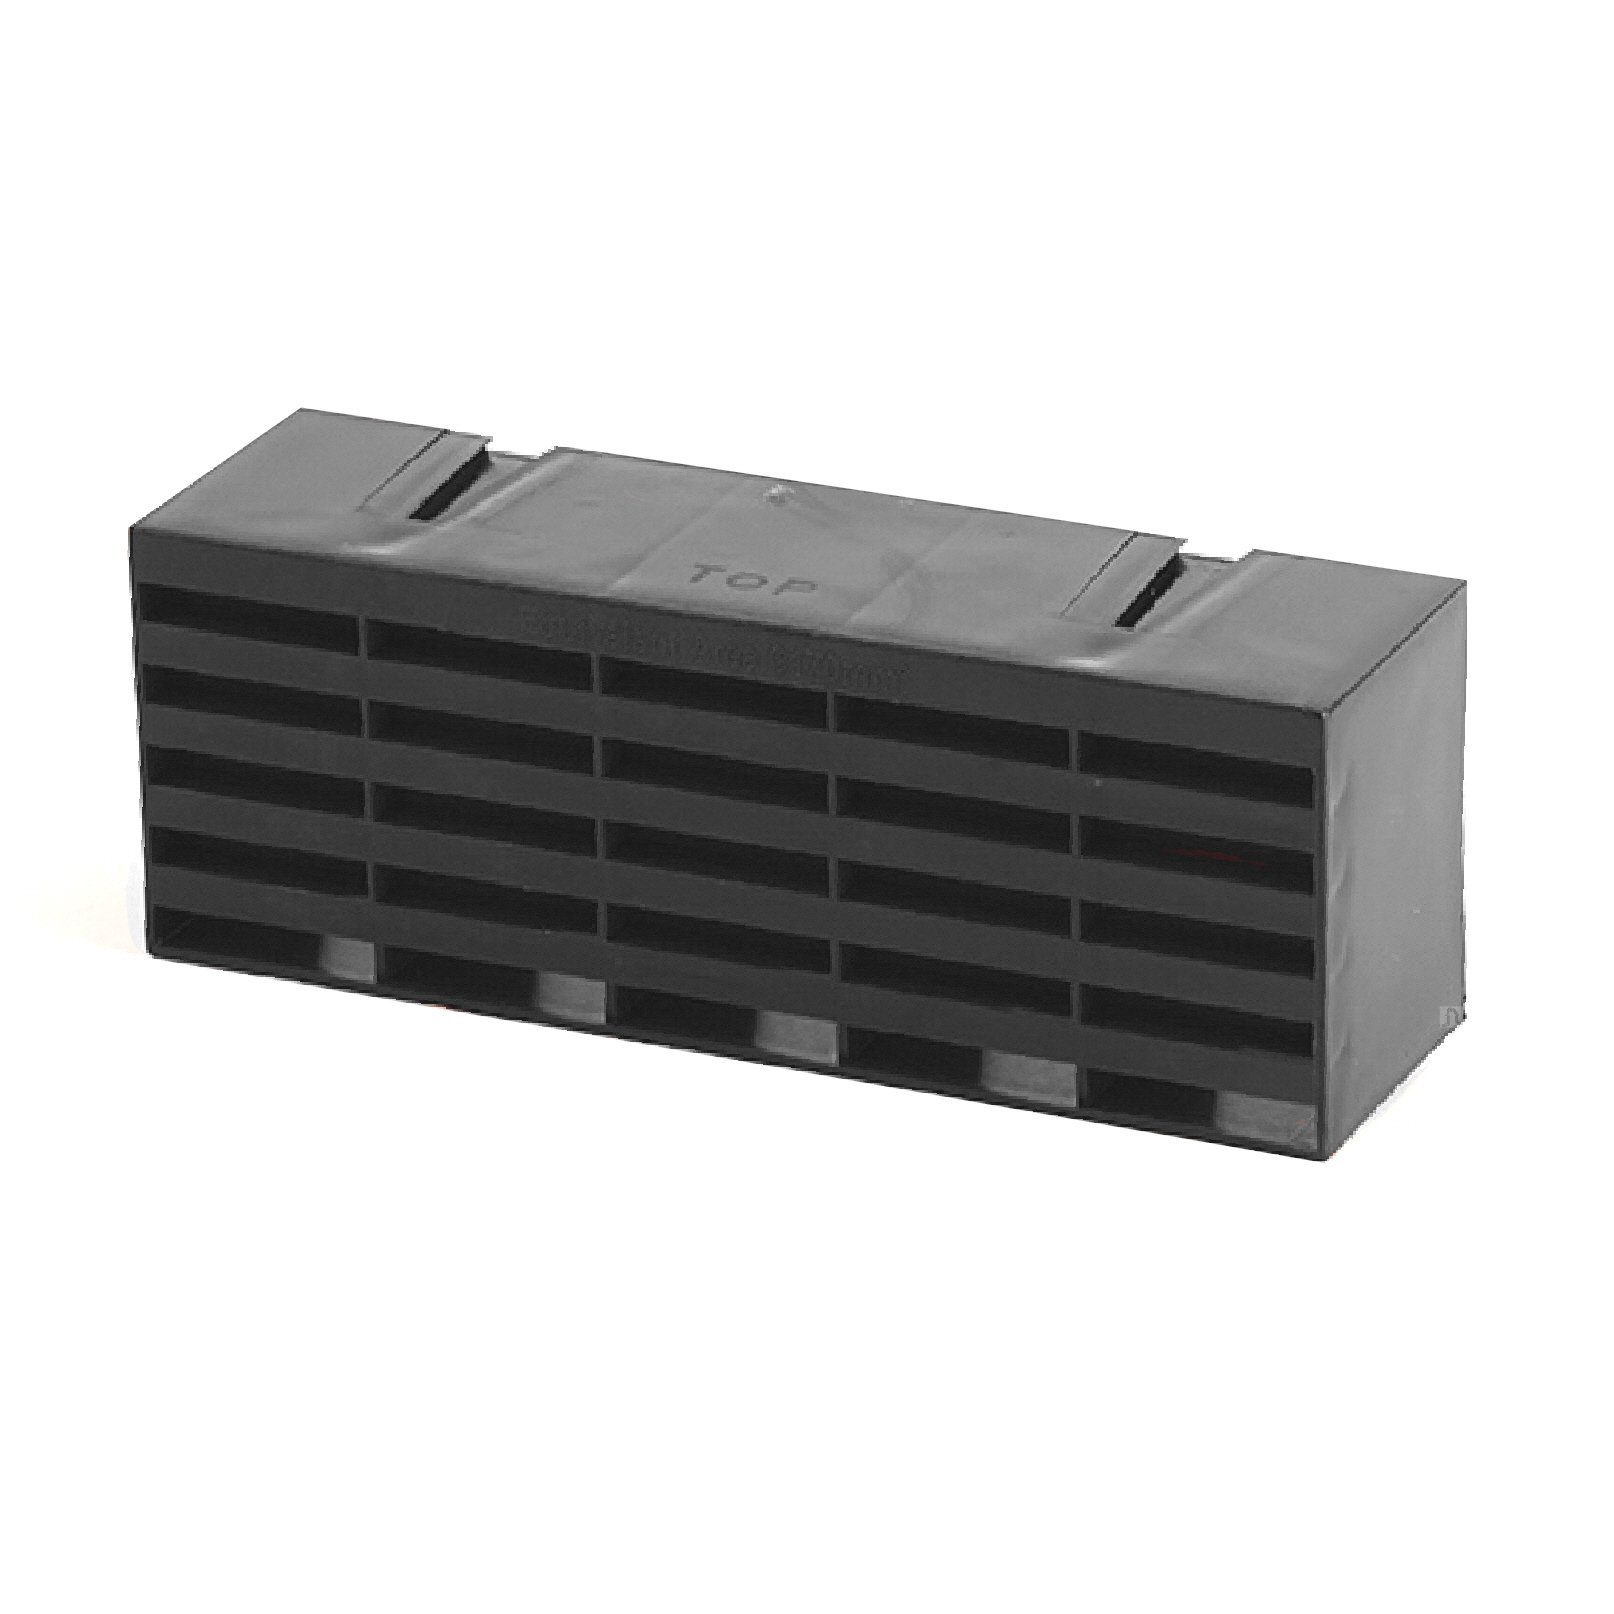 5 x Black Air Bricks Vent 9''x 3'' Airbrick Grille Air Flow Brick Ventilation